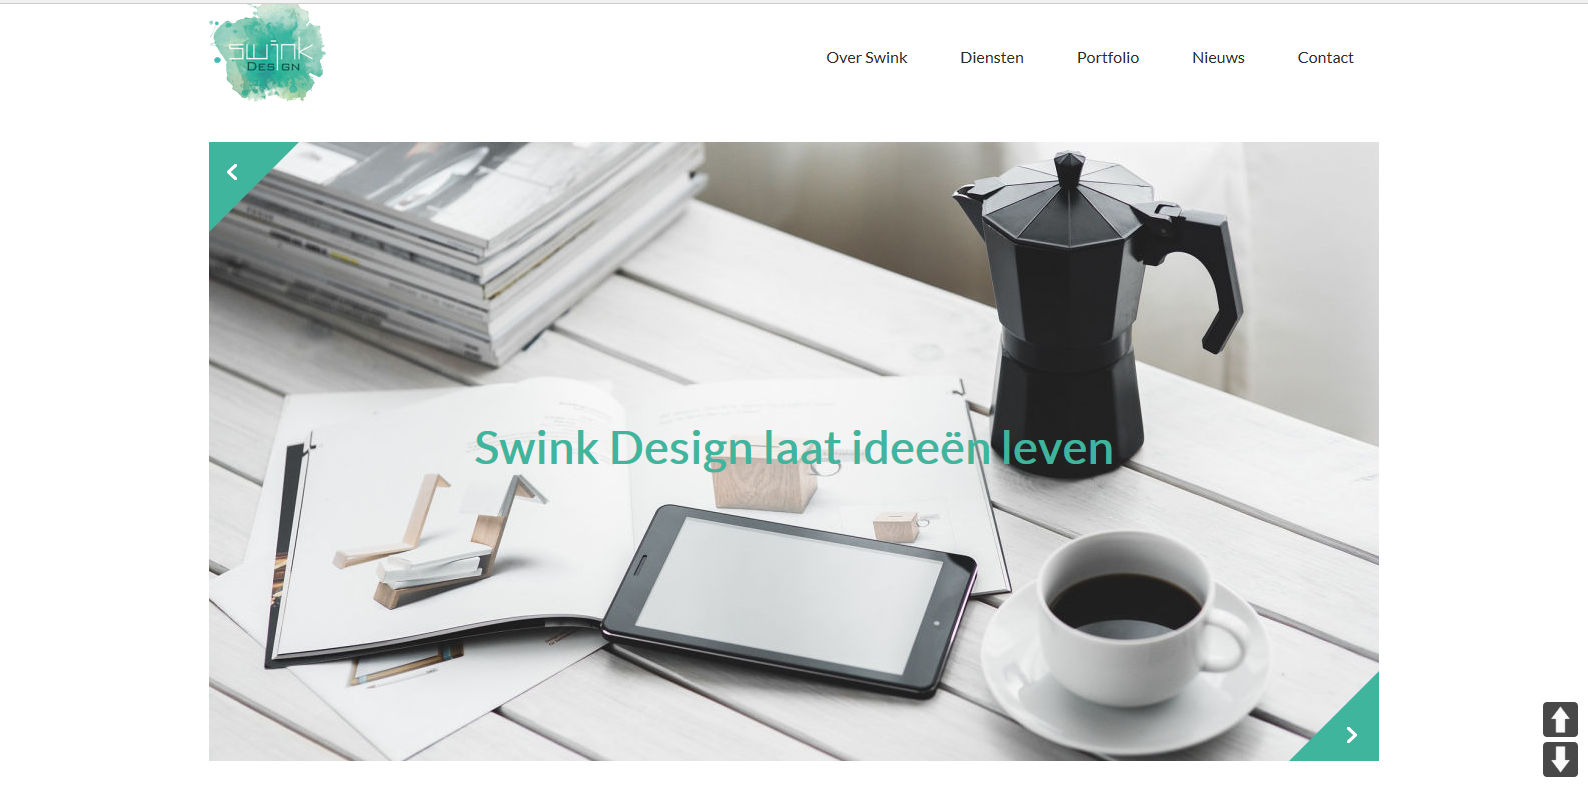 Swink Design